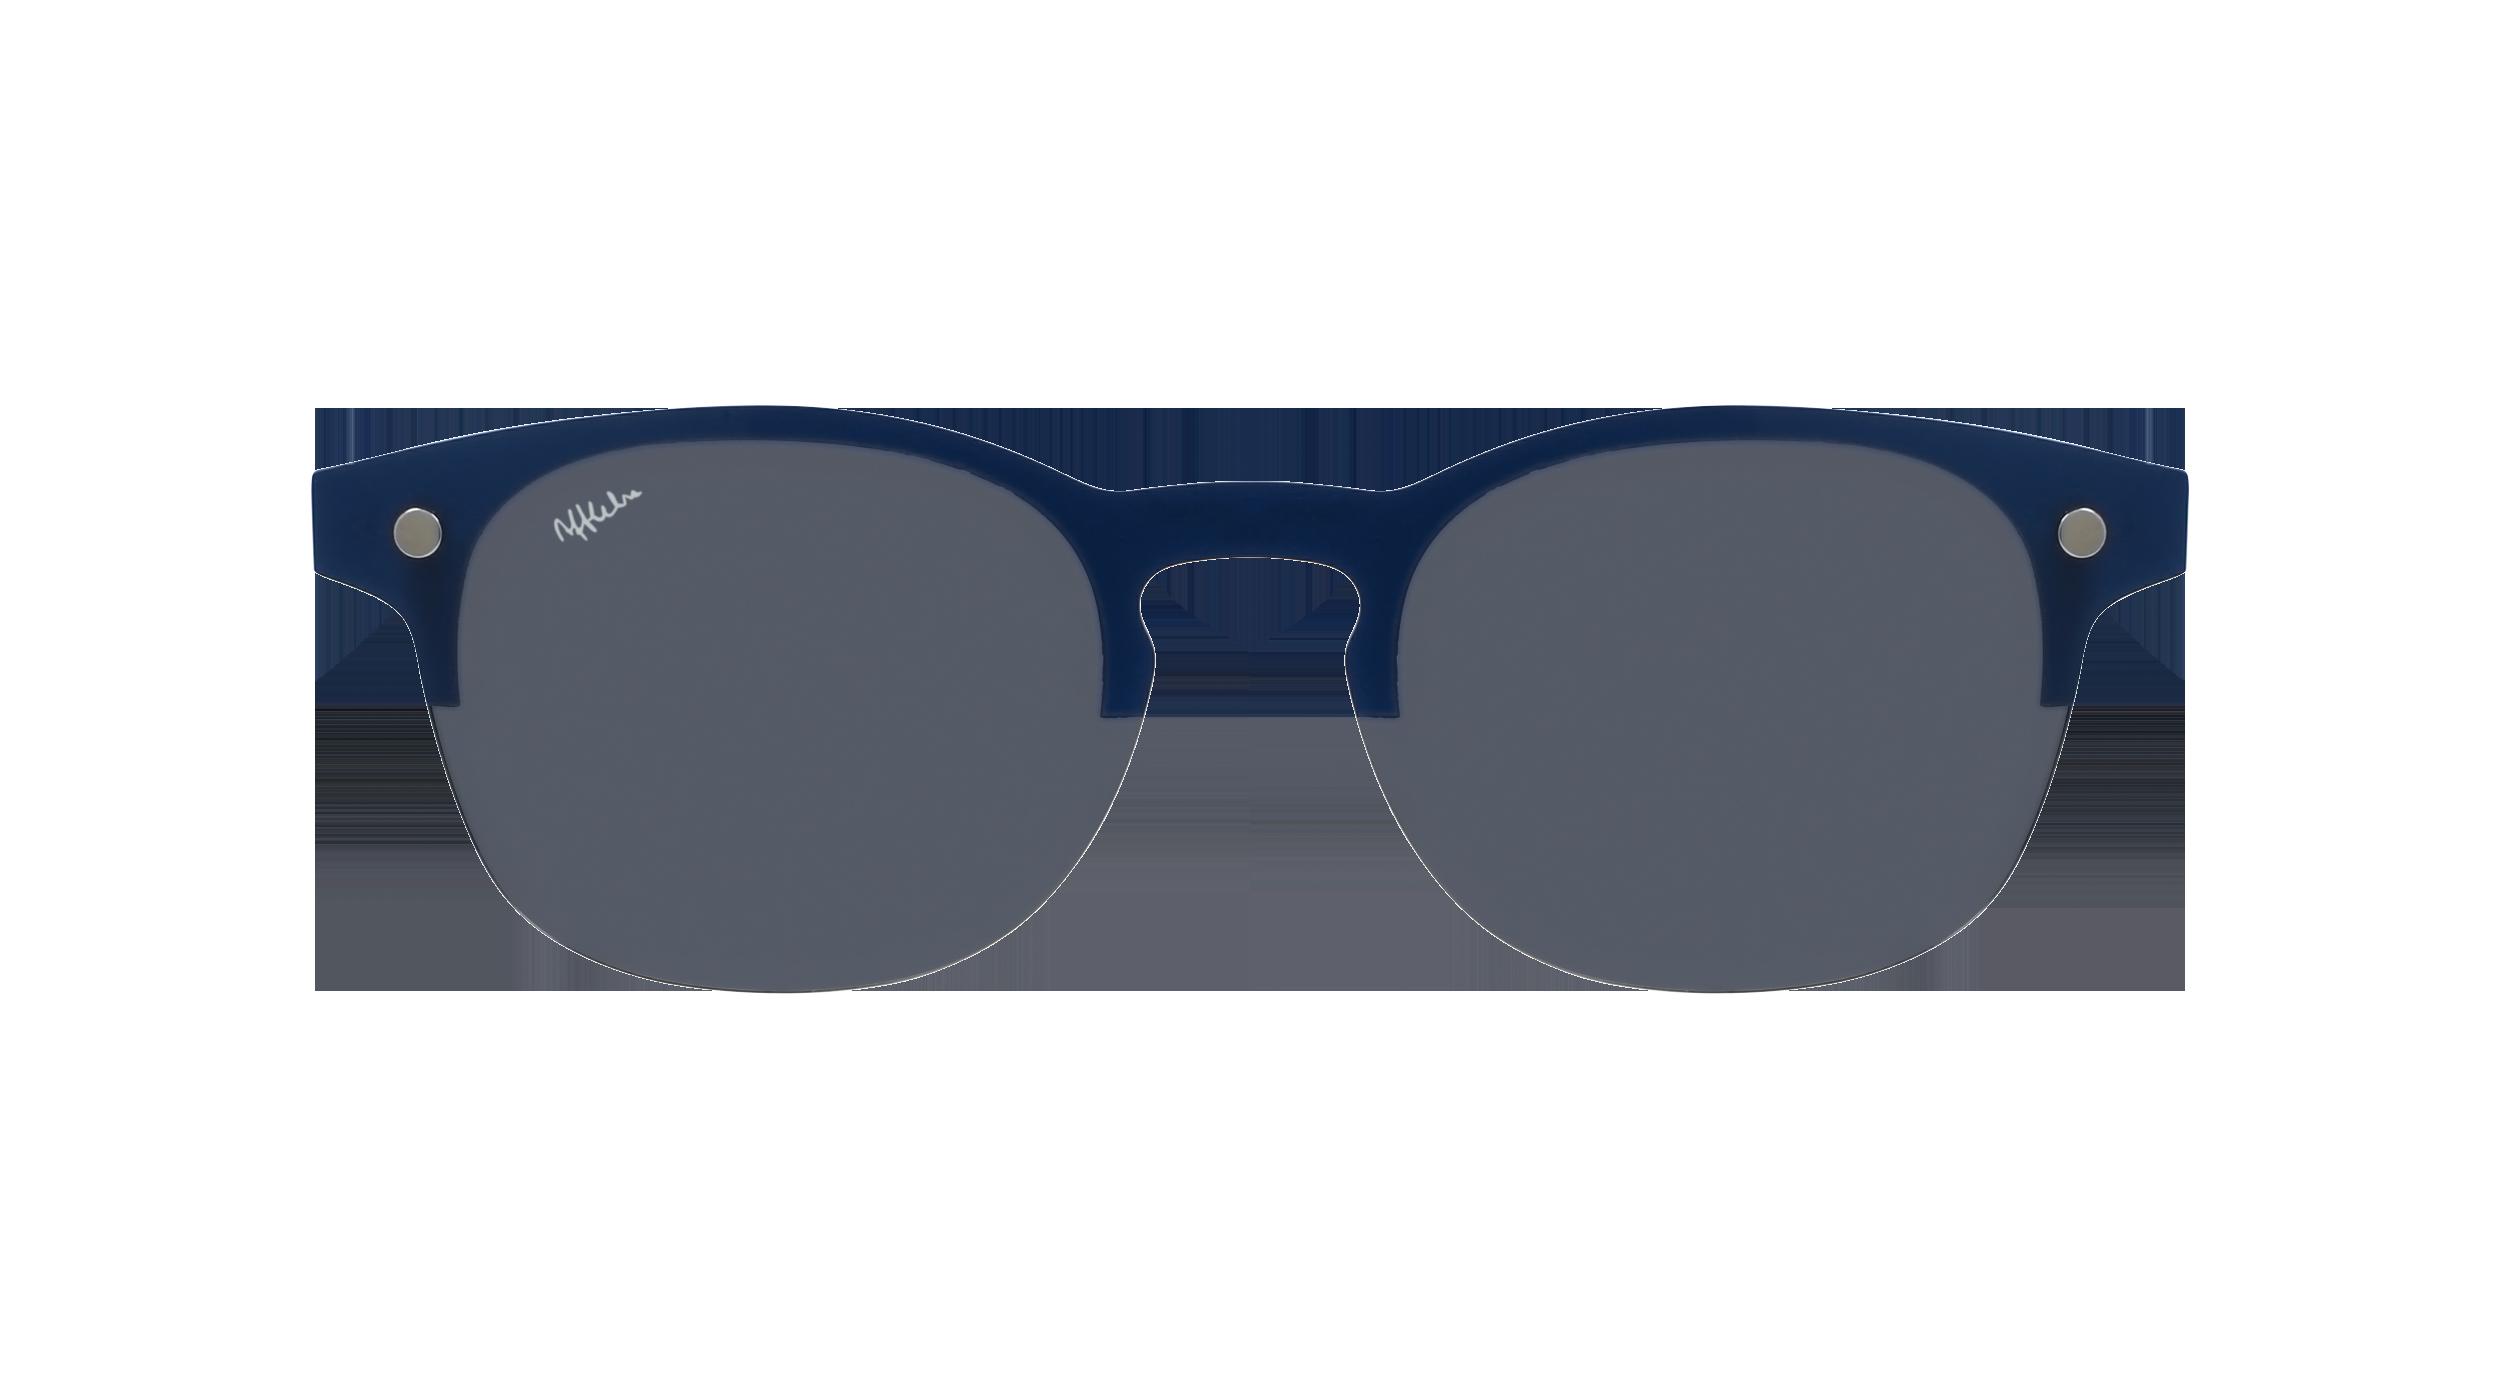 afflelou/france/products/smart_clip/clips_glasses/07630036457948.png